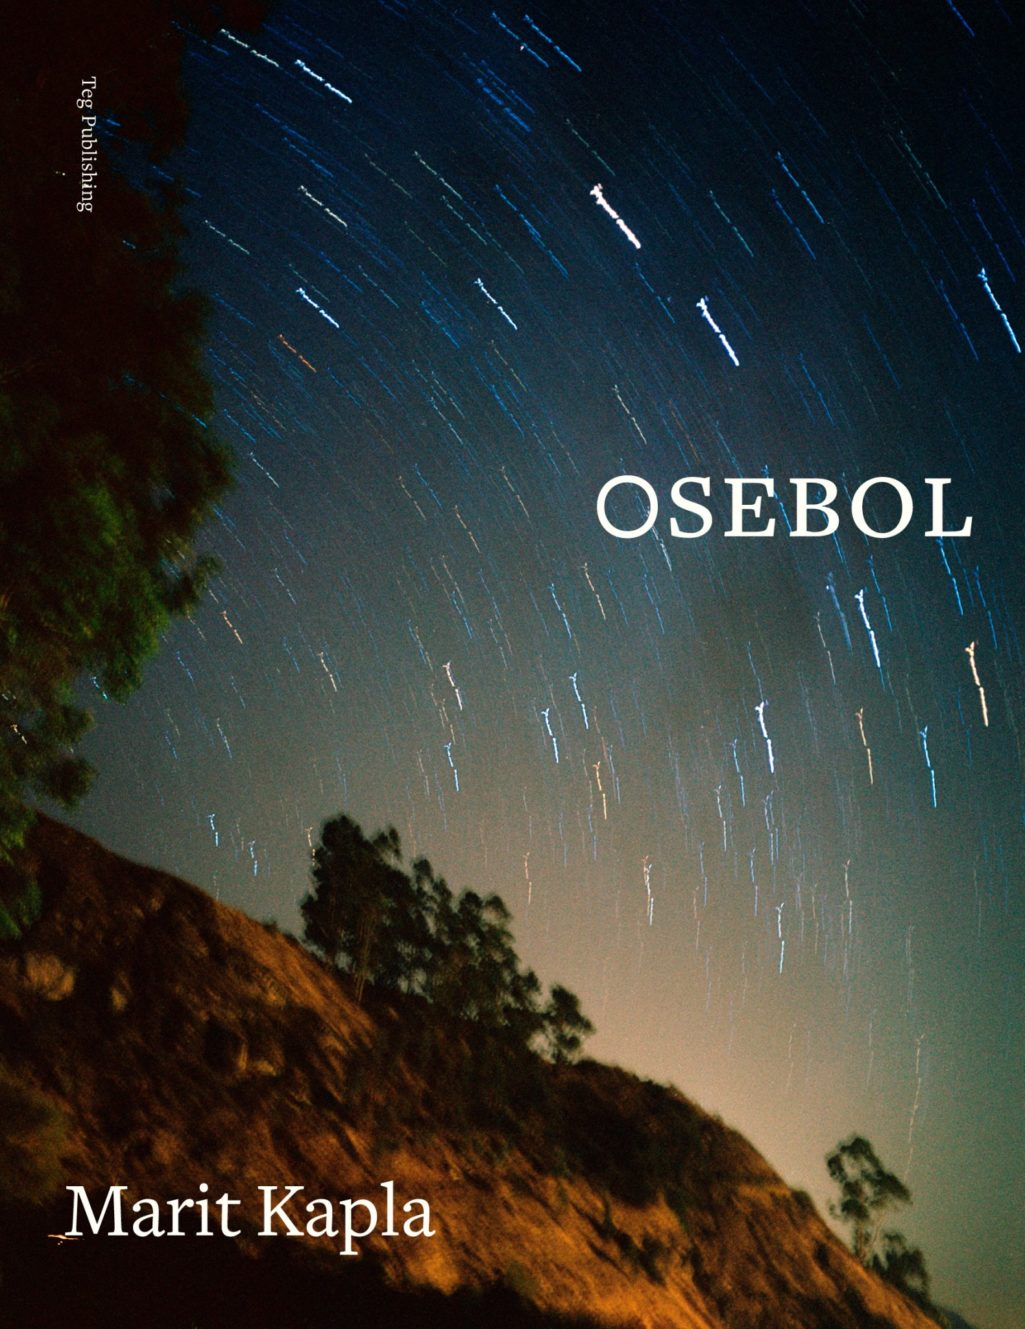 osebol-omslag-190115-790x10242x